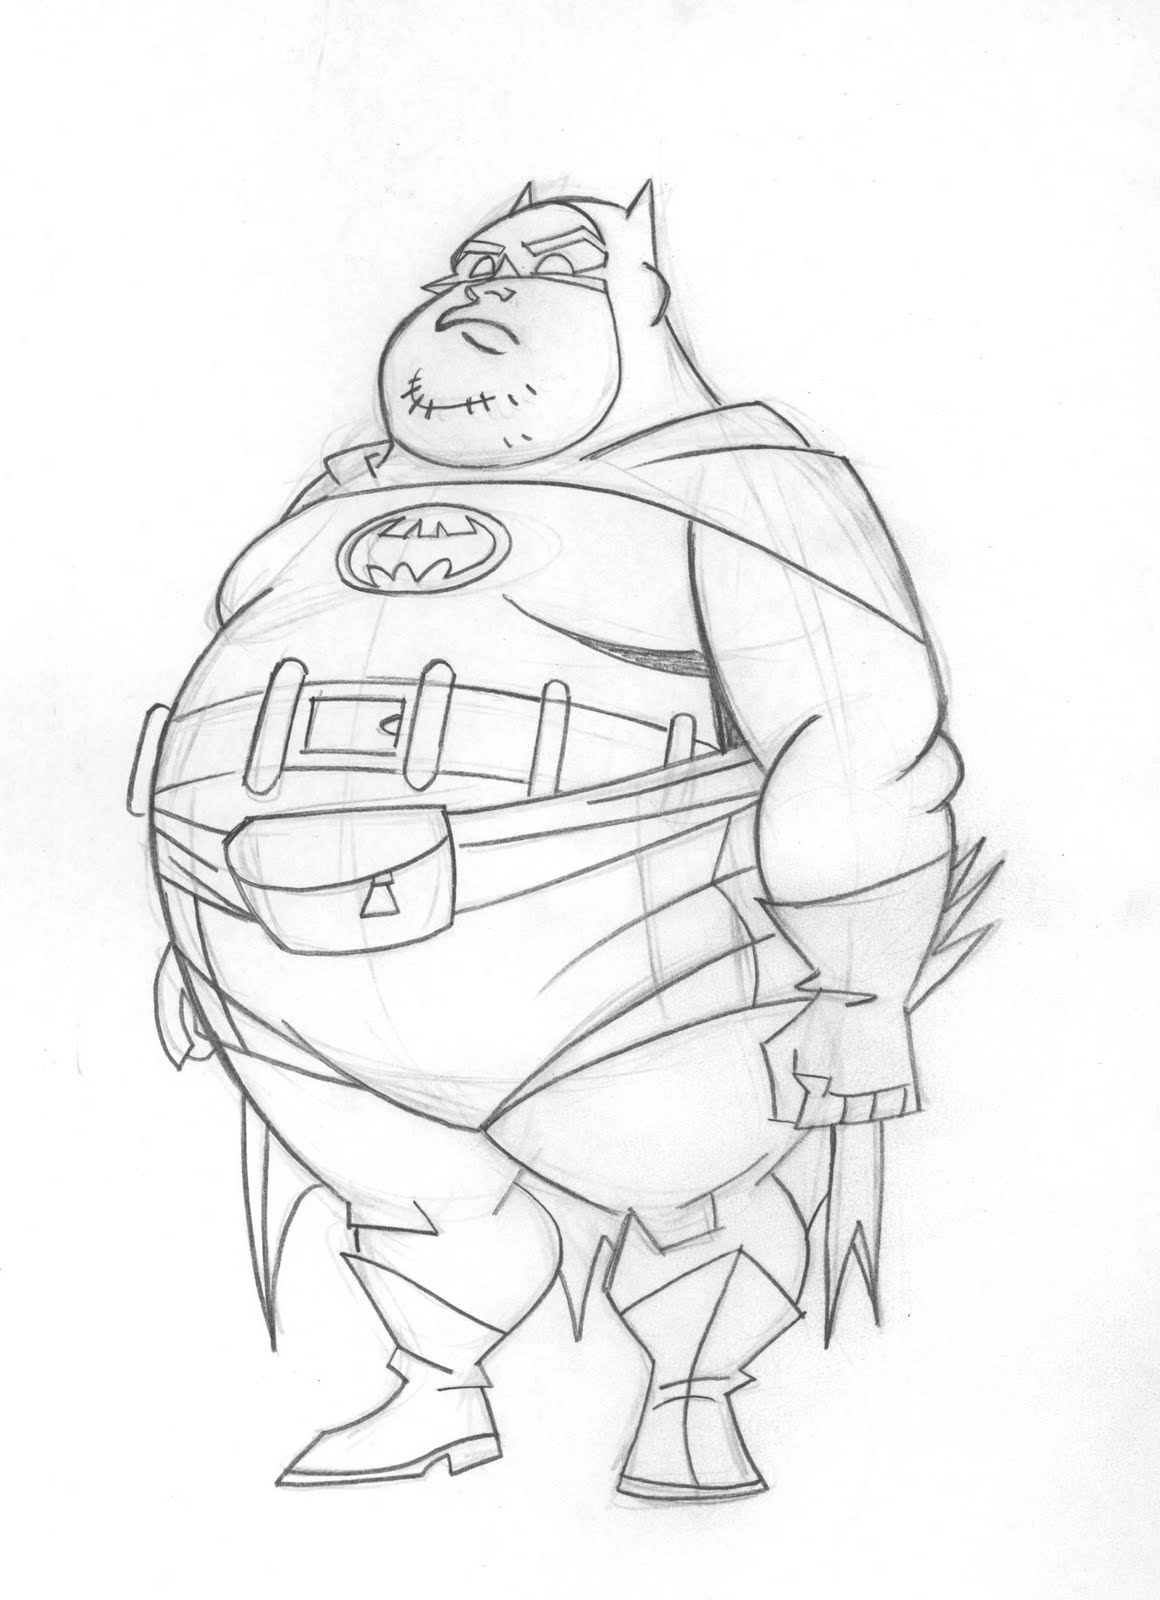 1160x1600 Batman Drawings Sketches Cool Sketches Of Batman Daily Sketch Blog